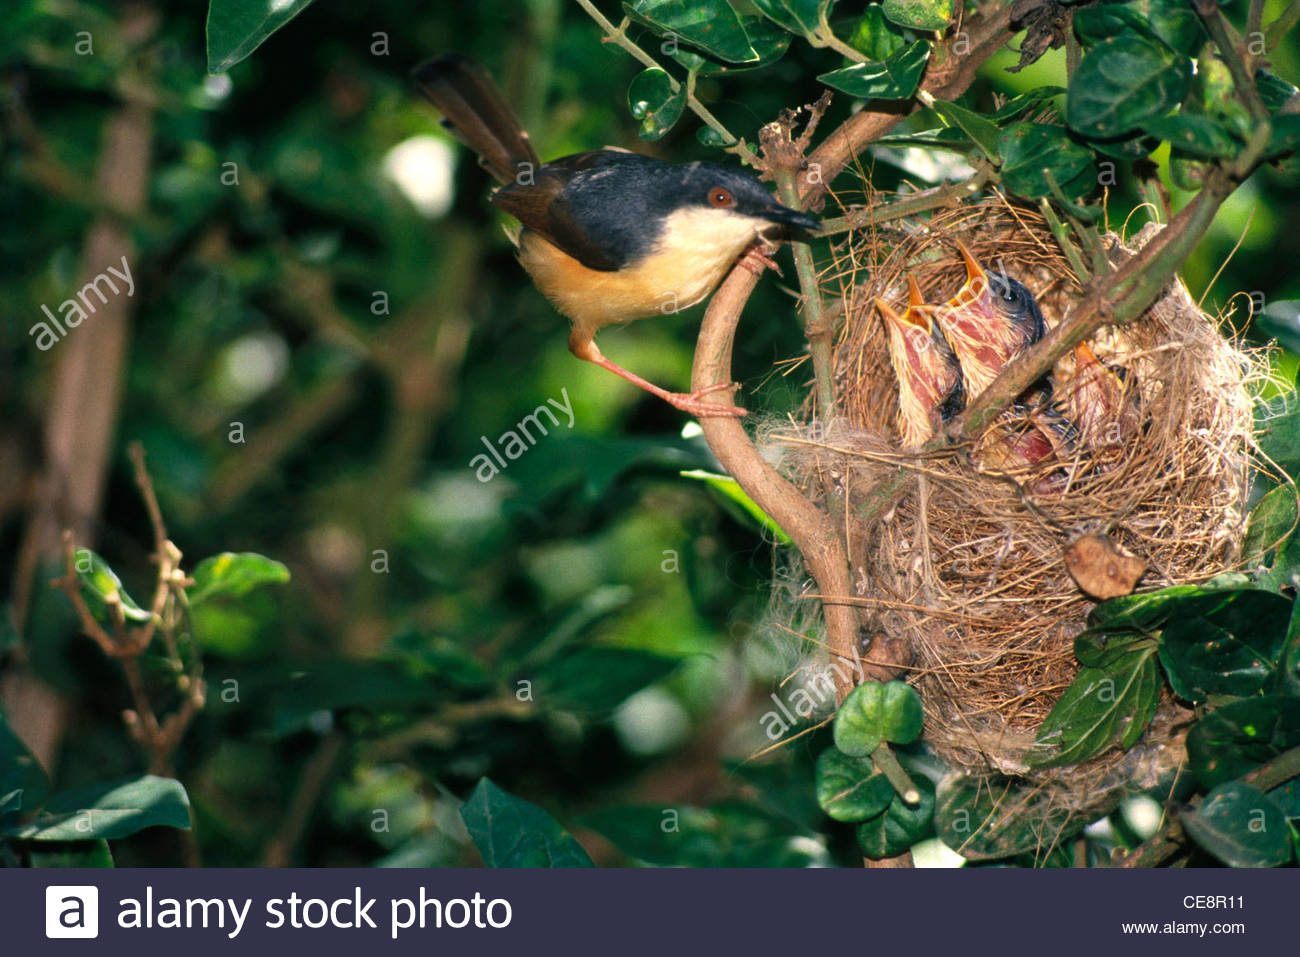 Sna 80418 : Birds Ashy Wren Warbler With Young Ones In Nest Prinia.